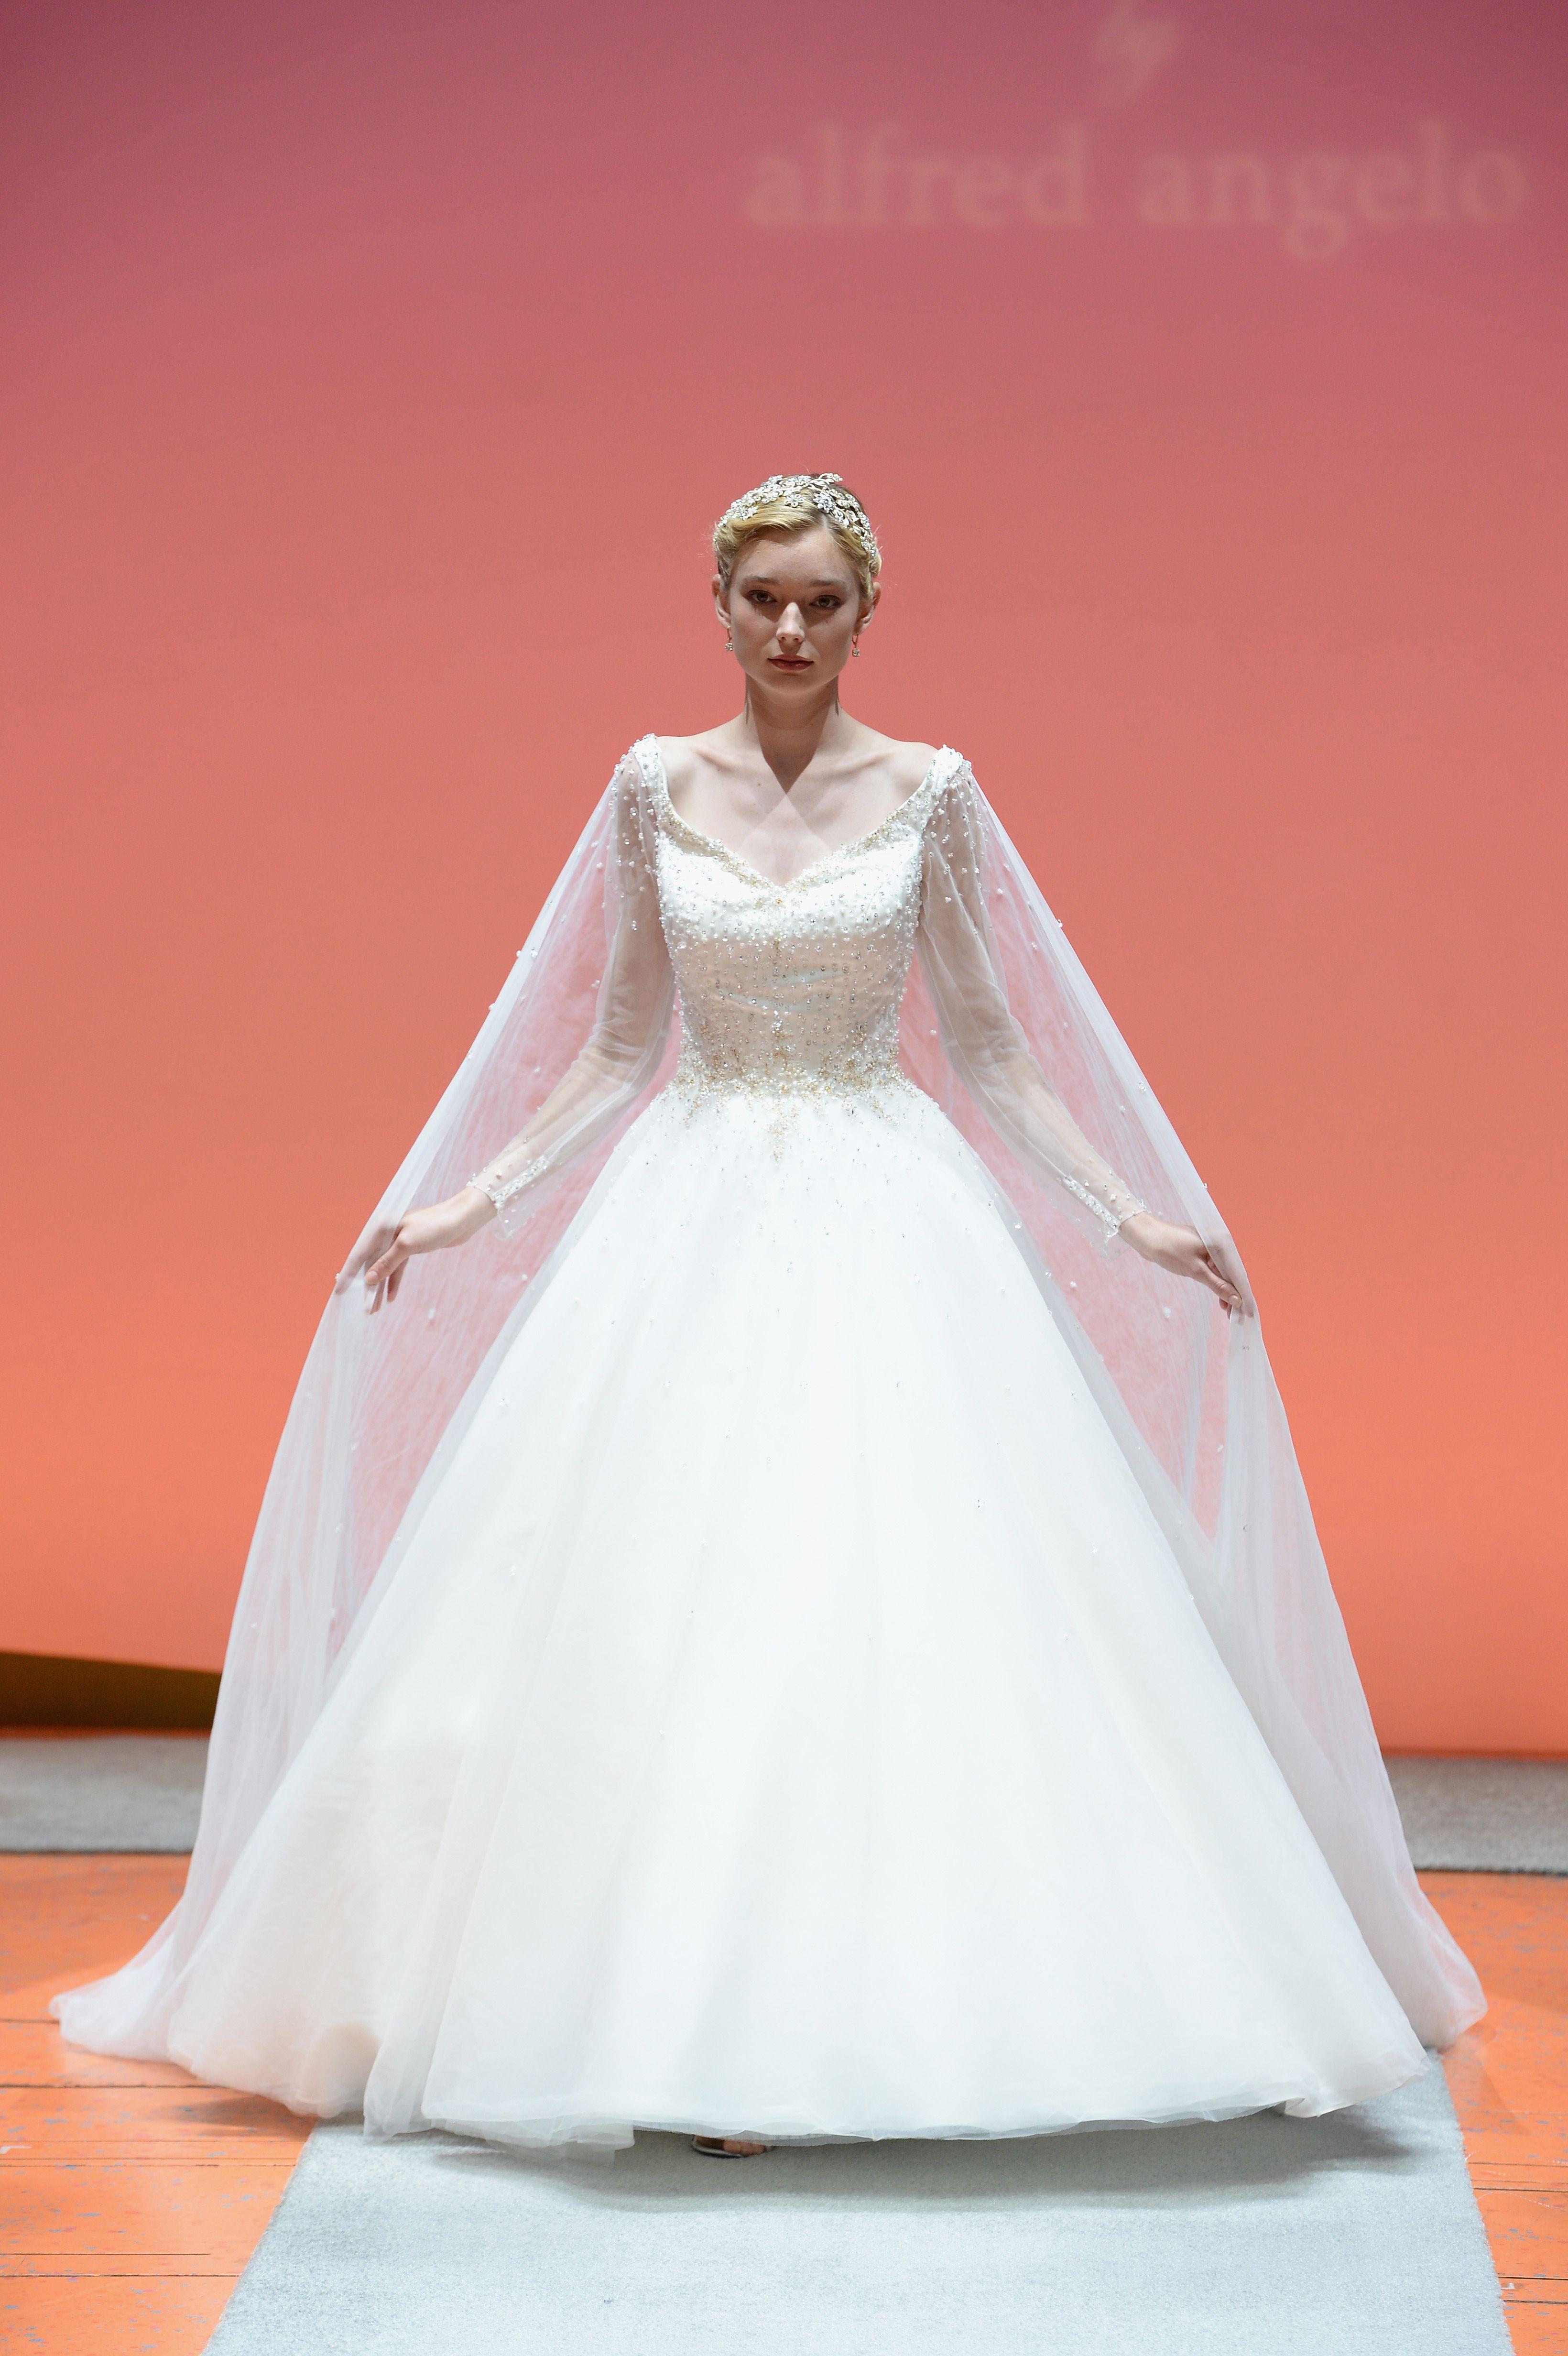 Fairytale Bride Dress